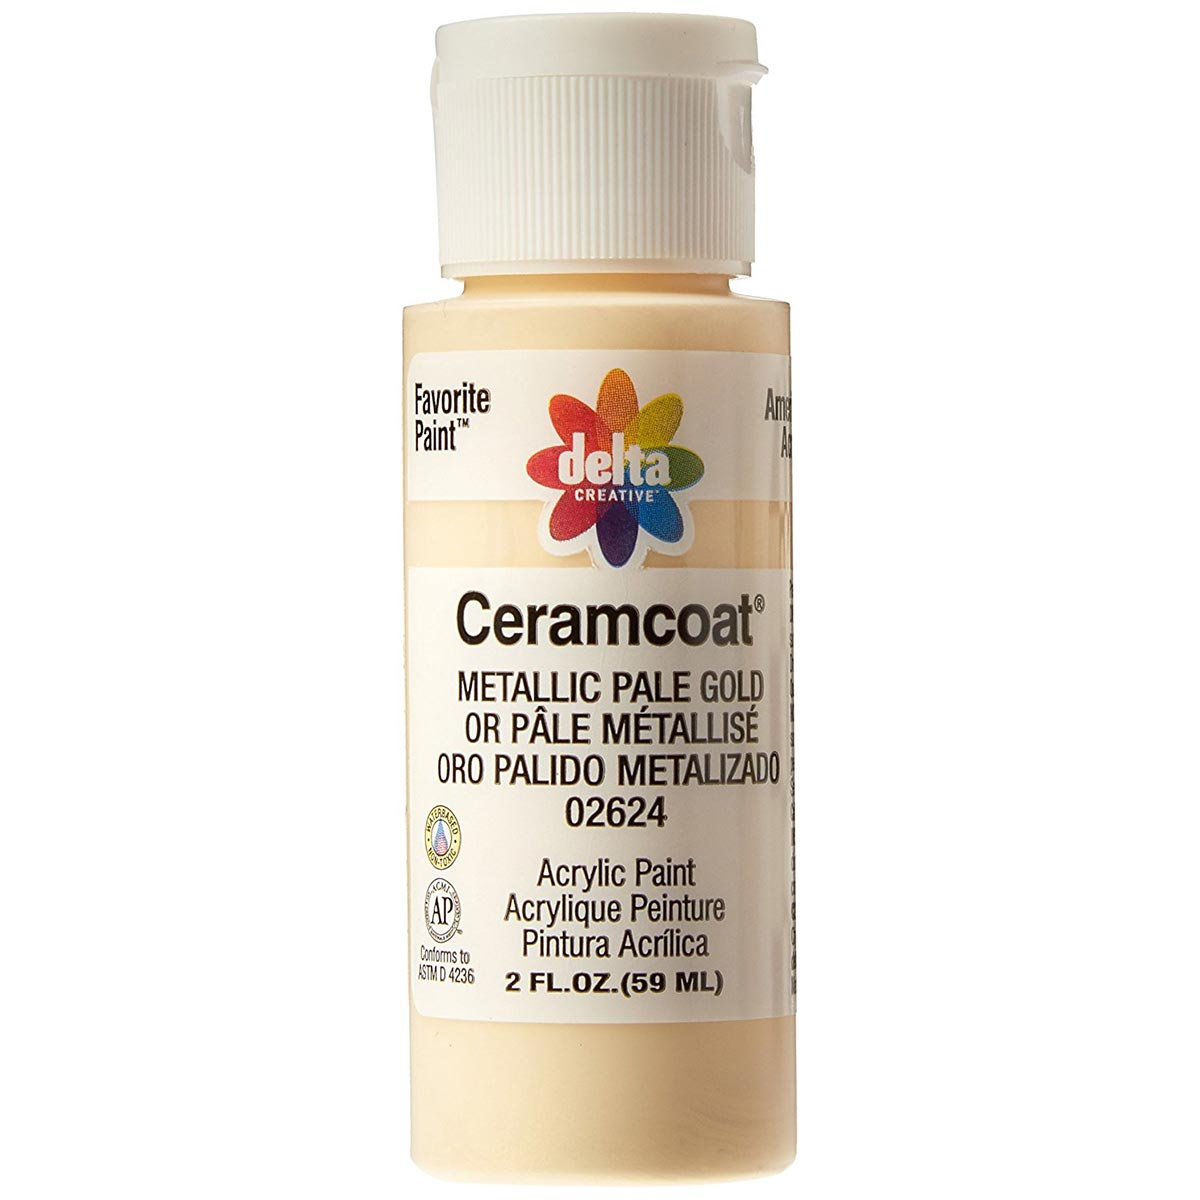 Delta Ceramcoat ® Acrylic Paint - Metallic Pale Gold, 2 oz.